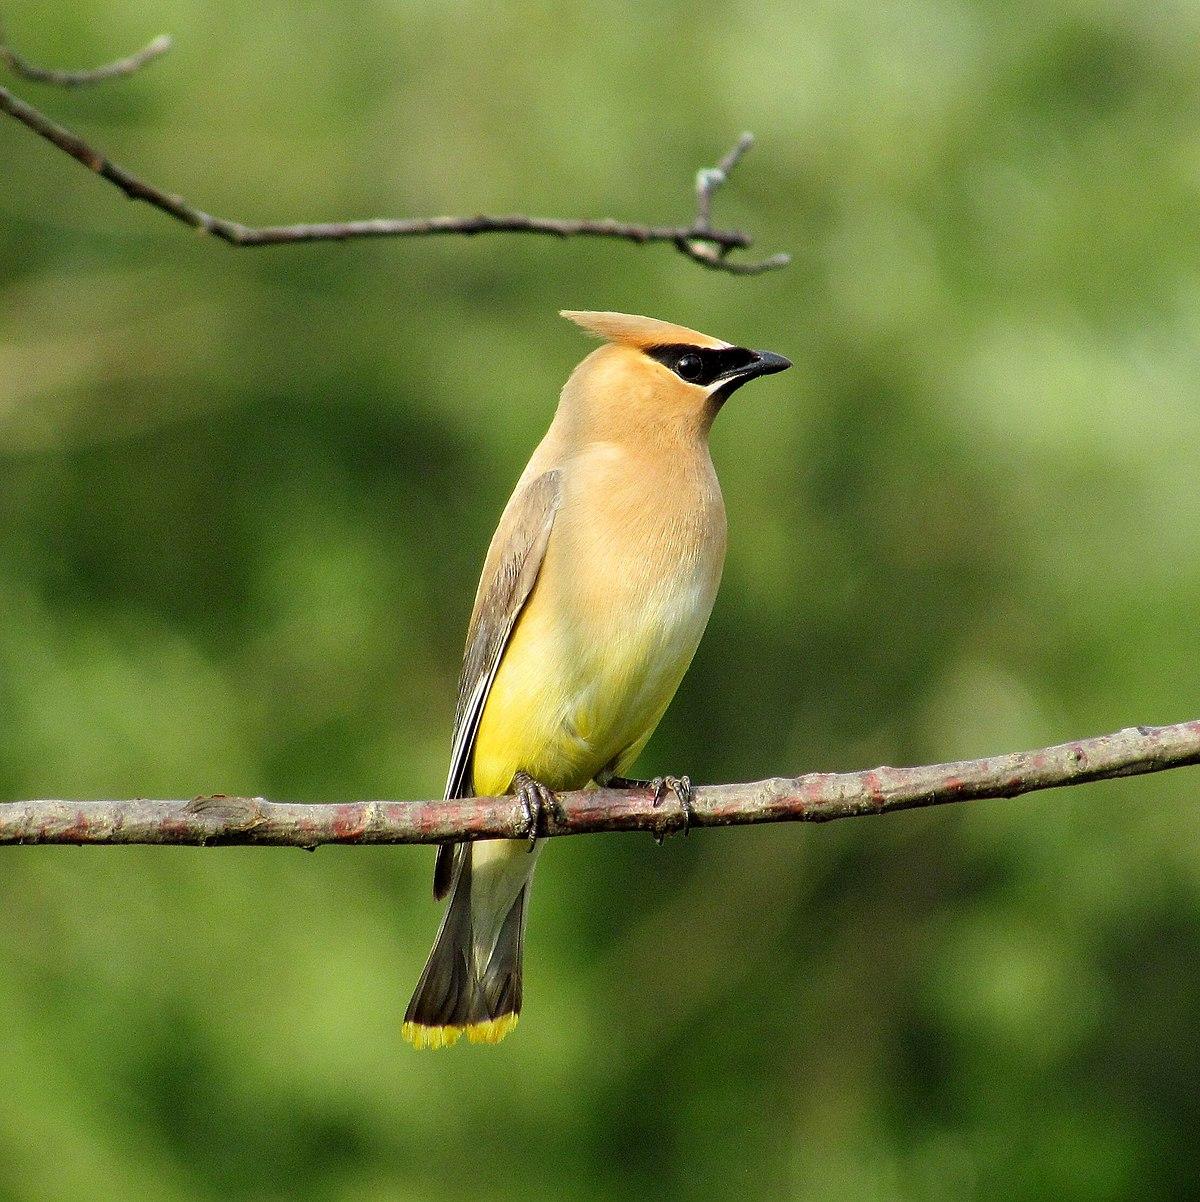 Cedar waxwing wikipedia for Birdhouse types